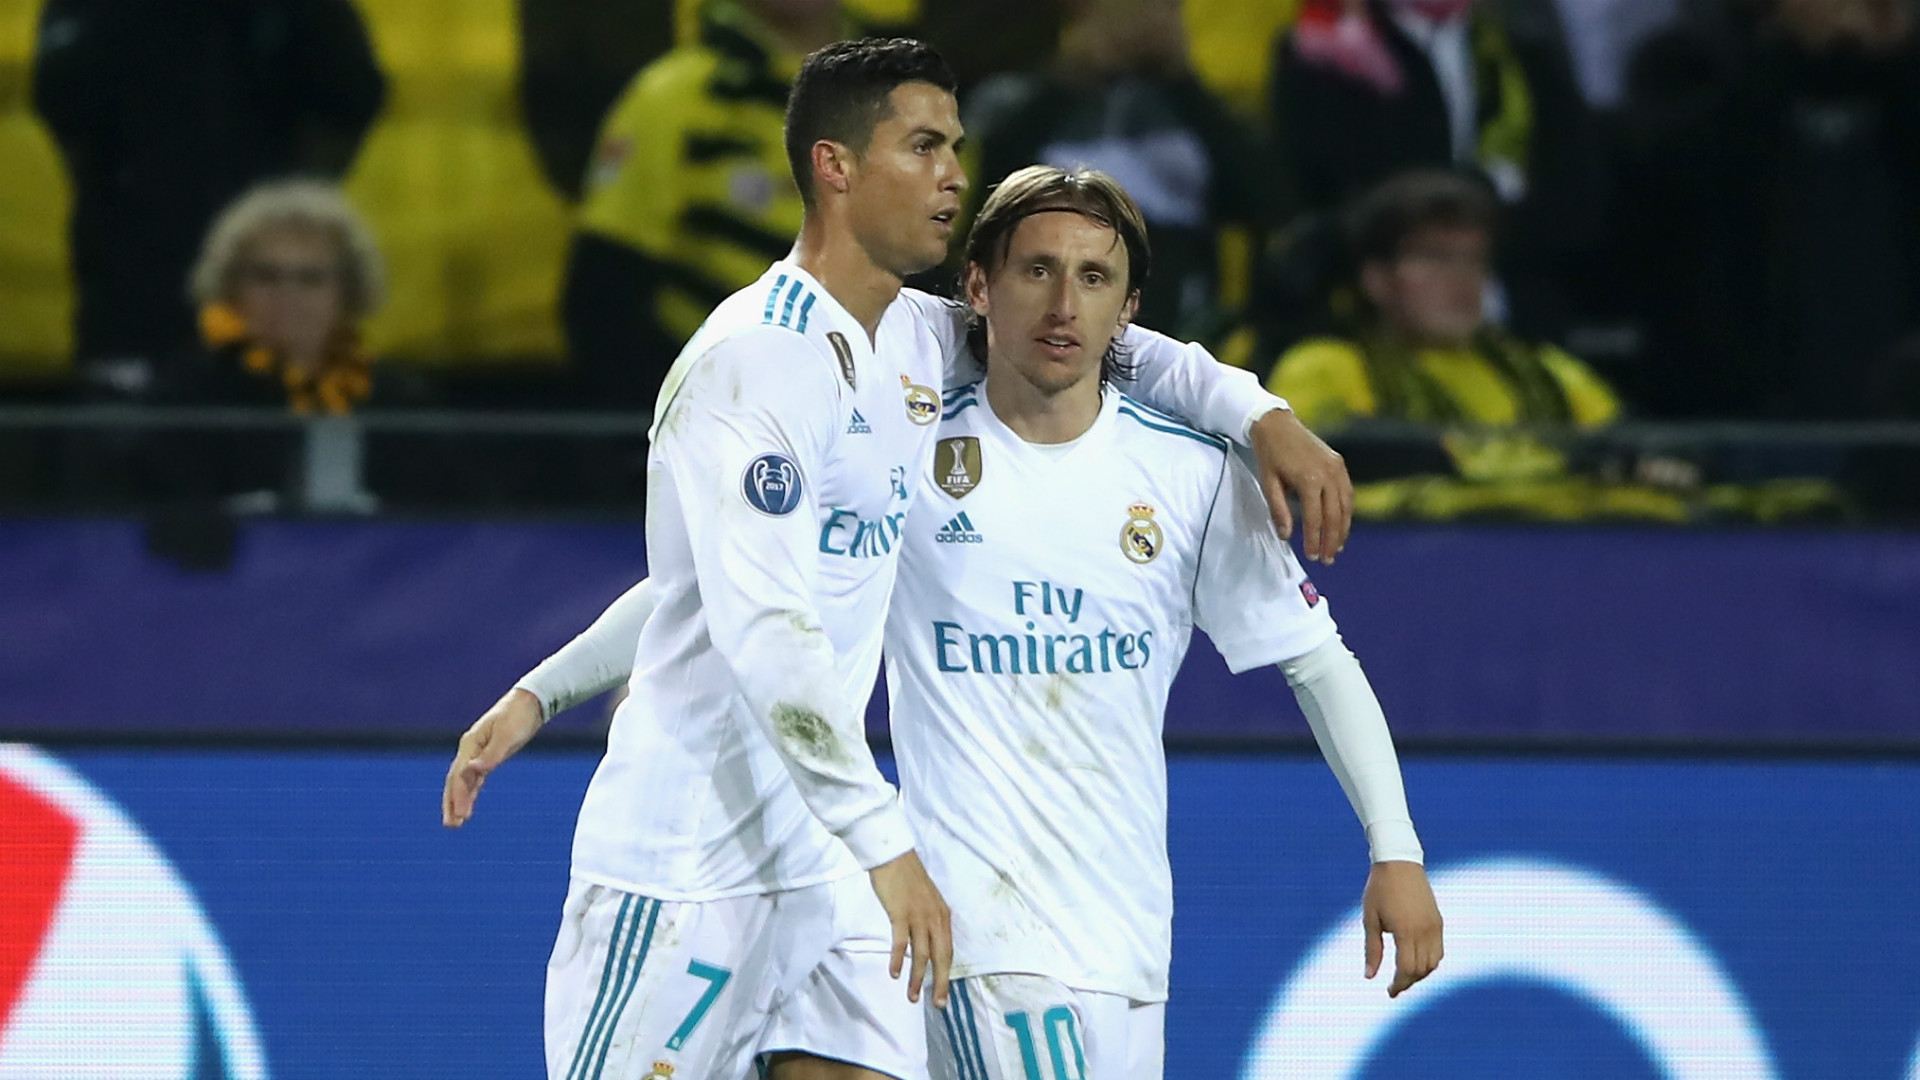 Cristiano Ronaldo Luka Modric Real Madrid 2017-18